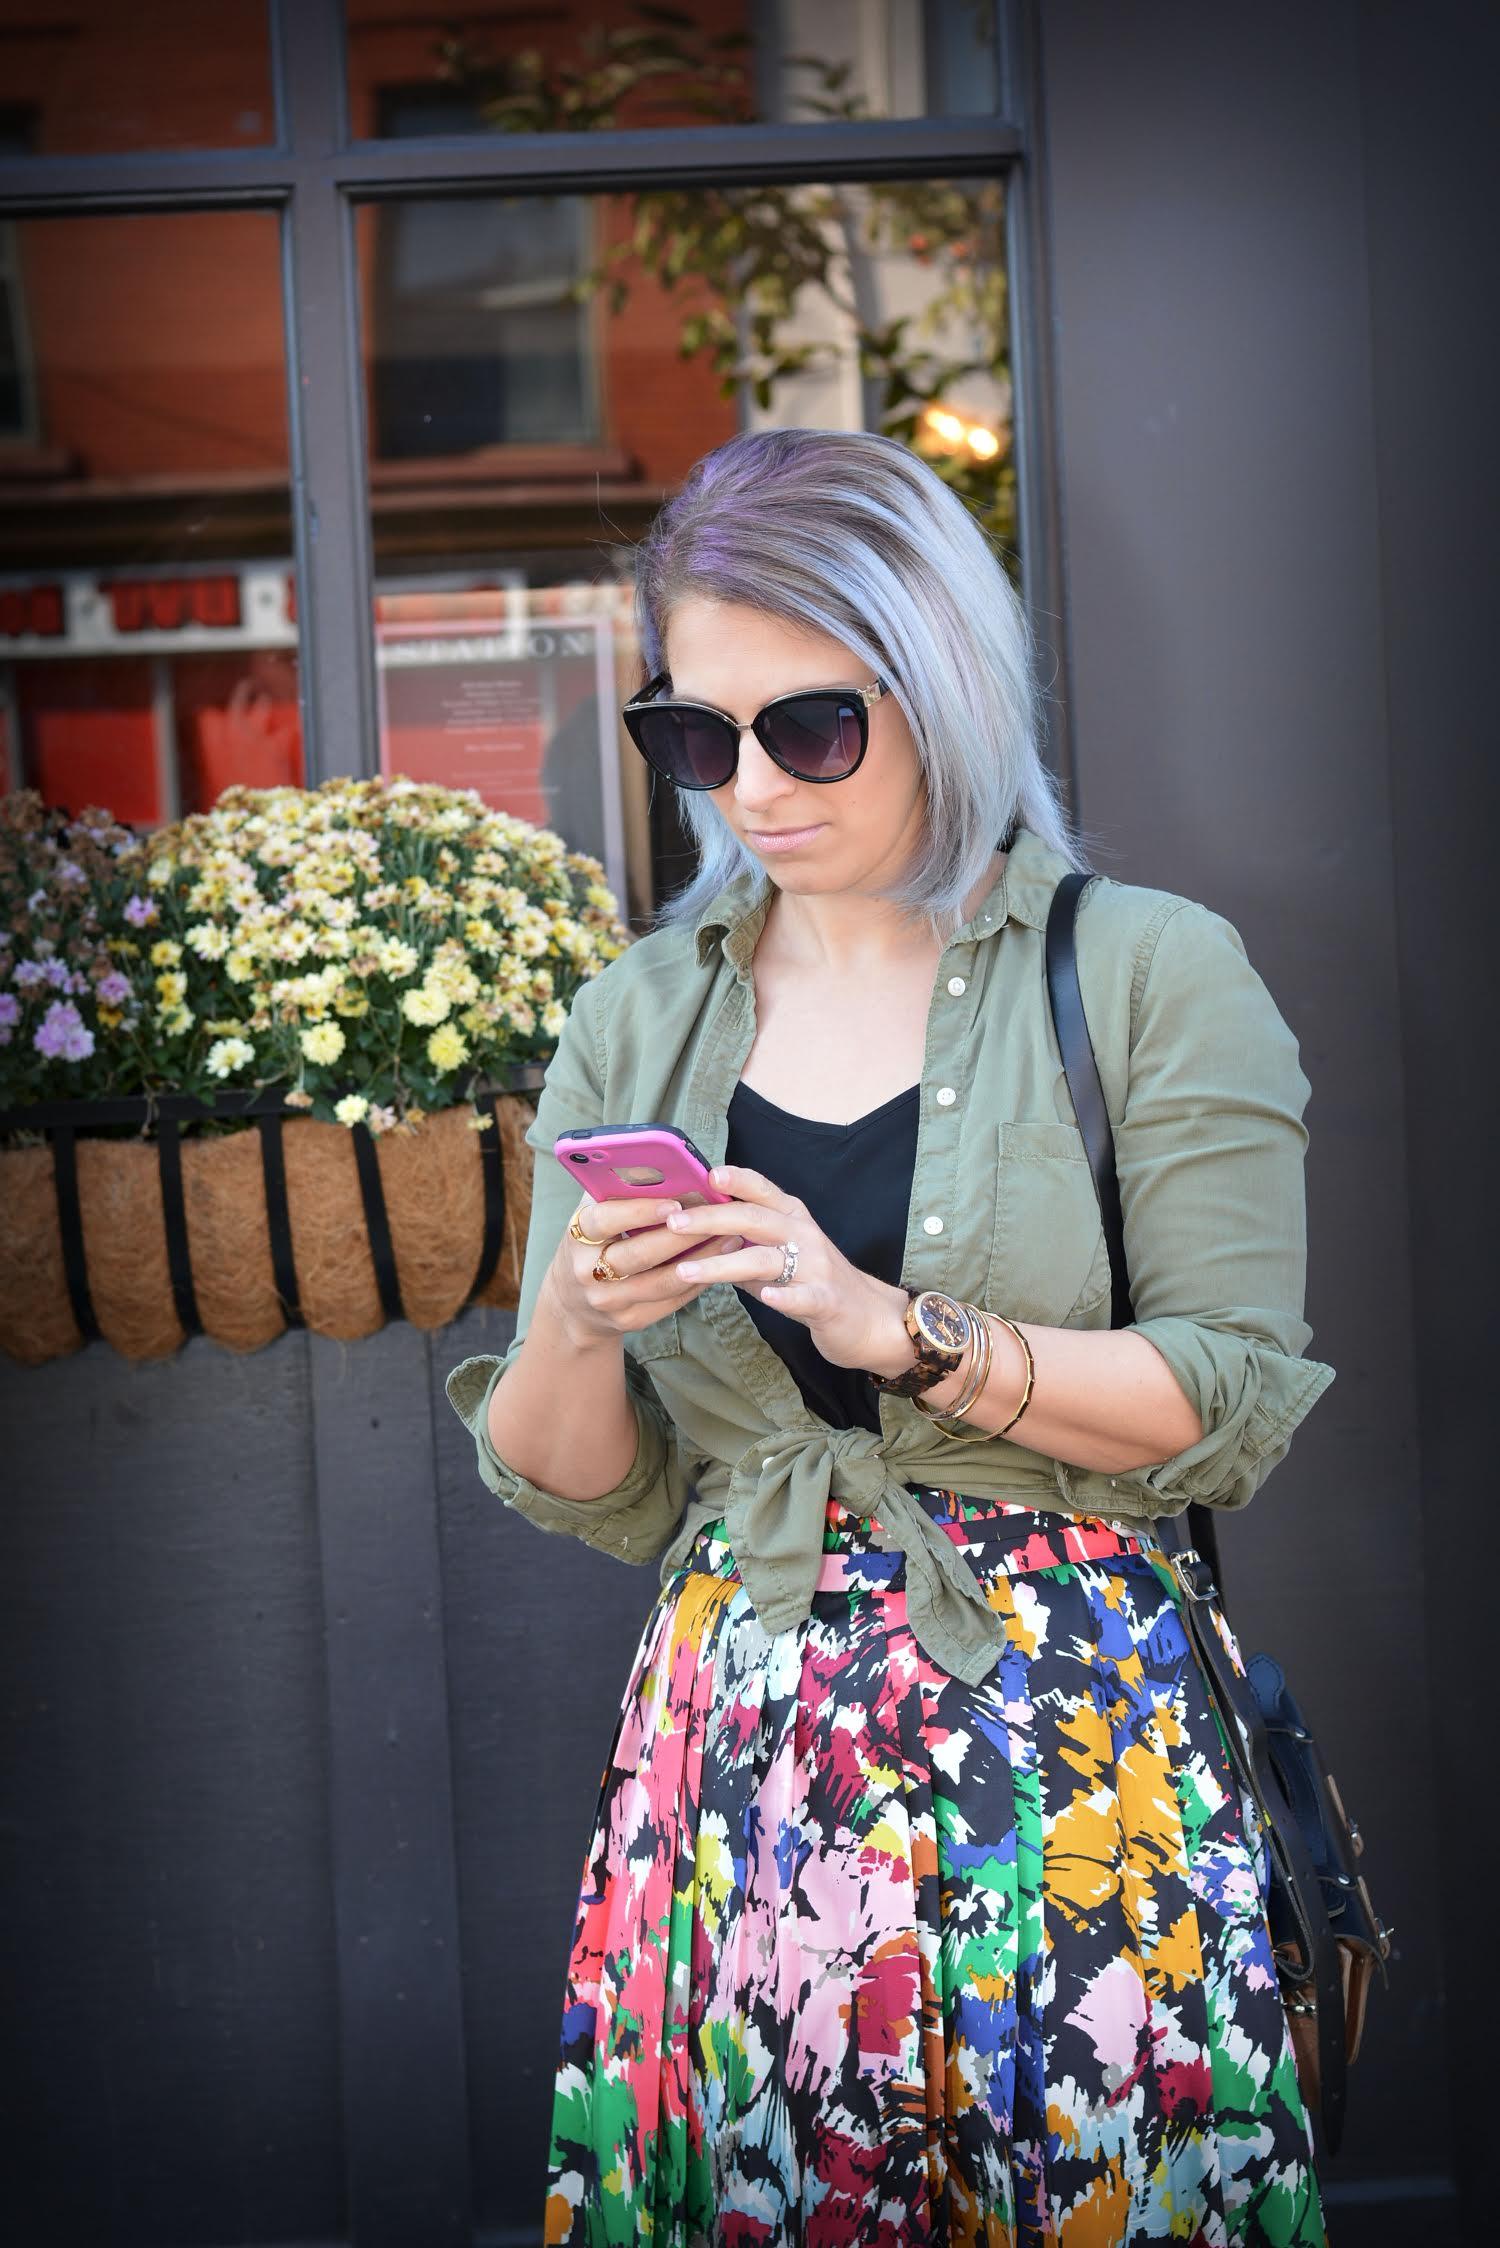 jcrew-skirt-iphone